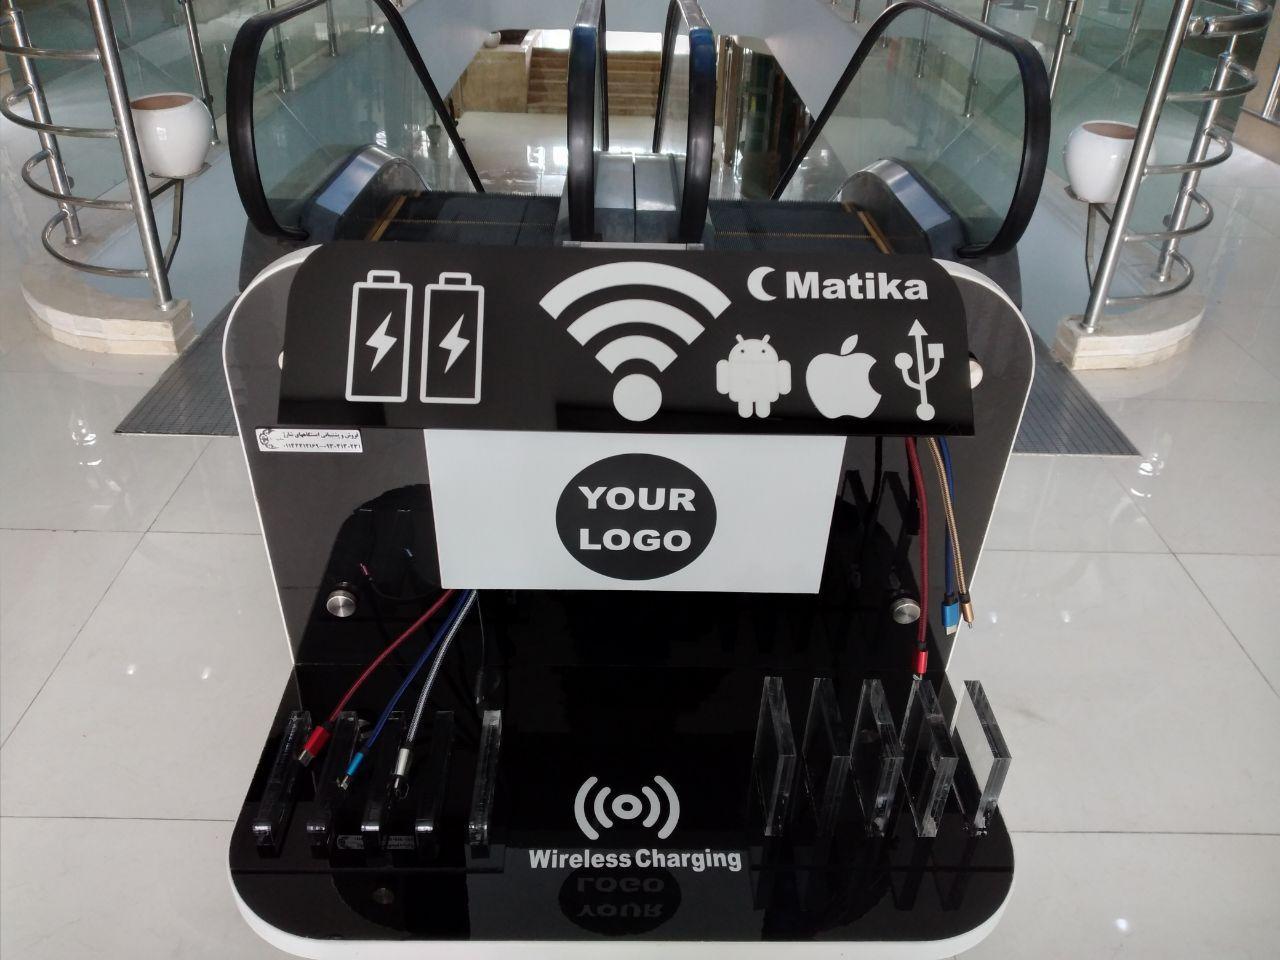 شارژر – شارژ موبایل – استند شارژر موبایل – استند شارژر اماکن عمومی – استند شارژ موبایل - استند شارژ - ایستگاه شارژ موبایل - شارژر موبایل - شارژر اماکن عمومی - شارژرهای عمومی - شارژر موبایل اماکن عمومی - شارژر وایرلس - شارژر بی سیم – ایستگاه شارژ - شارژرهای فست - شارژر رومیزی – استند موبایل – استند عمومی موبایل – شارژر عمومی – تابلو اعلانات – تابلو اطلاعات هوشمند – شارژر چندتایی – تابلو اطلاع رسانیشارژر – شارژر موبایل – شارژر چندتایی – شارژر بی سیم  - شارژر وایرلس - شارژر سامسونگ – شارژر شیائومی -موبایل هوآوی – شارژر اپل – شارژر نوکیا - شارژر آنر – شارژر ایسوس -  شارژر ارد - شارژر ال جی - شارژر  اچ تی سی – شارژر موتورولا - شارژر جی ال ایکس – شارژر دوجی - شارژر  بلو – شارژر گیگاست – شارژر هیوندای - شارژر بلک بری – شارژر سونی – شارژر مارشال - شارژر  تکنو -  تکنو - شارژر جی پلاس – شارژر گوگل - شارژر سونی اریکسون – شارژر لنوو – شارژر ایسر –